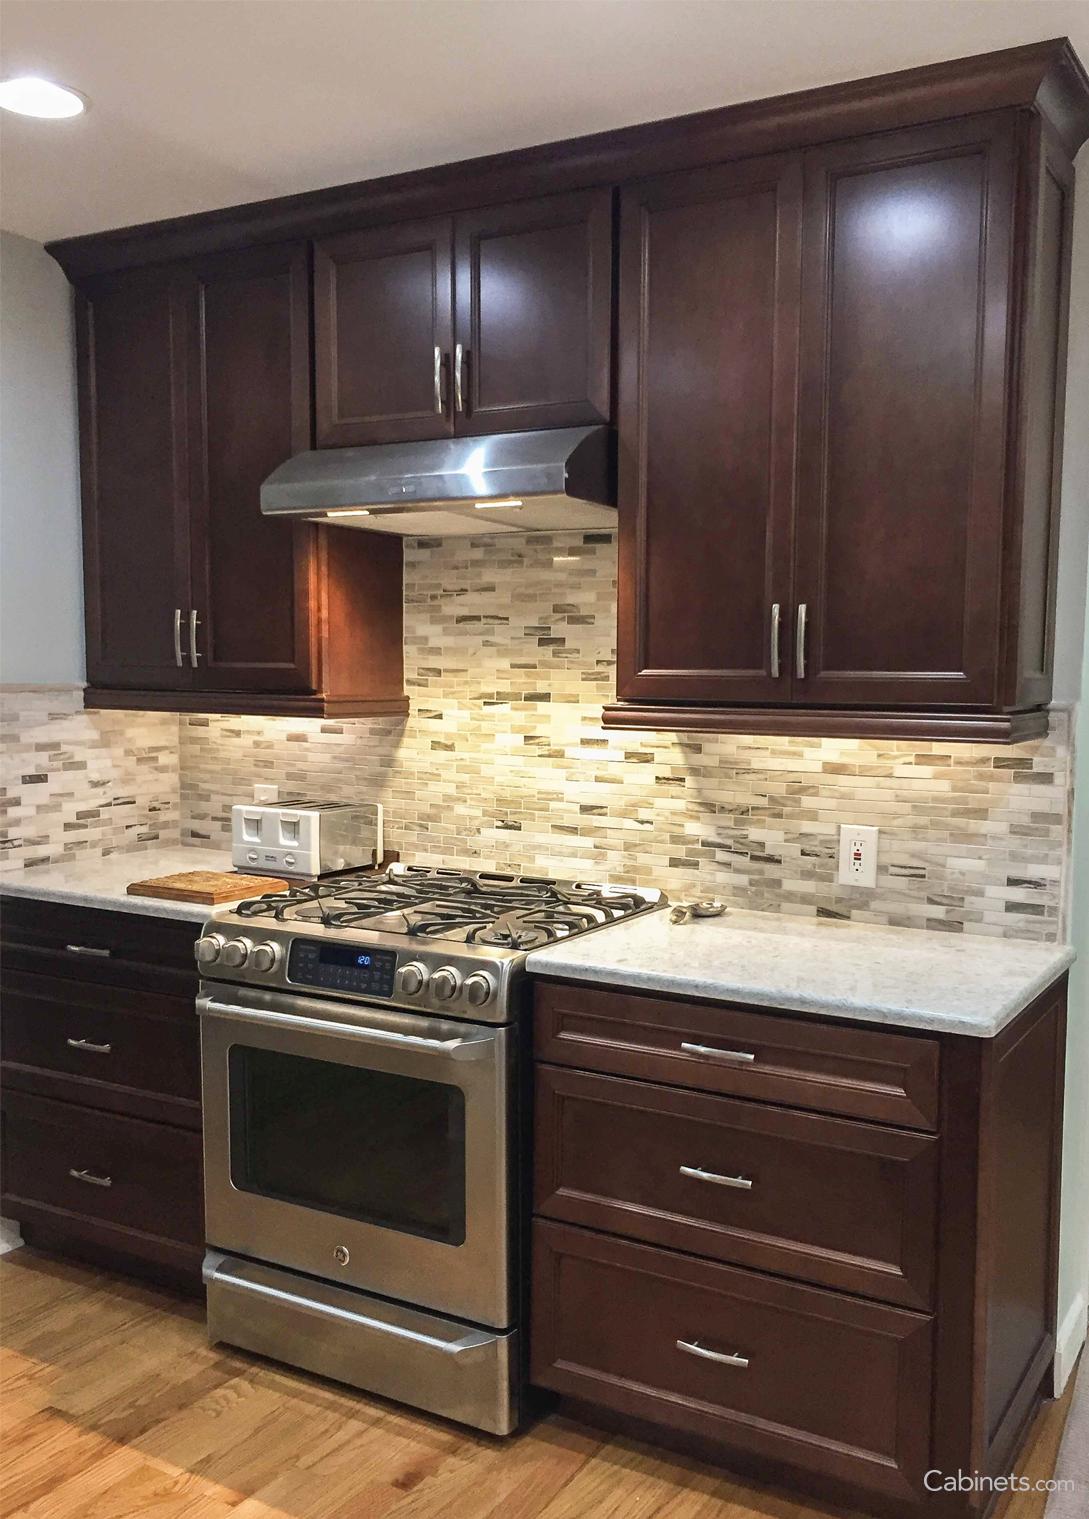 We Love These Dark Cabinets Kitchen Remodel Small Kitchen Backsplash Designs Kitchen Remodel